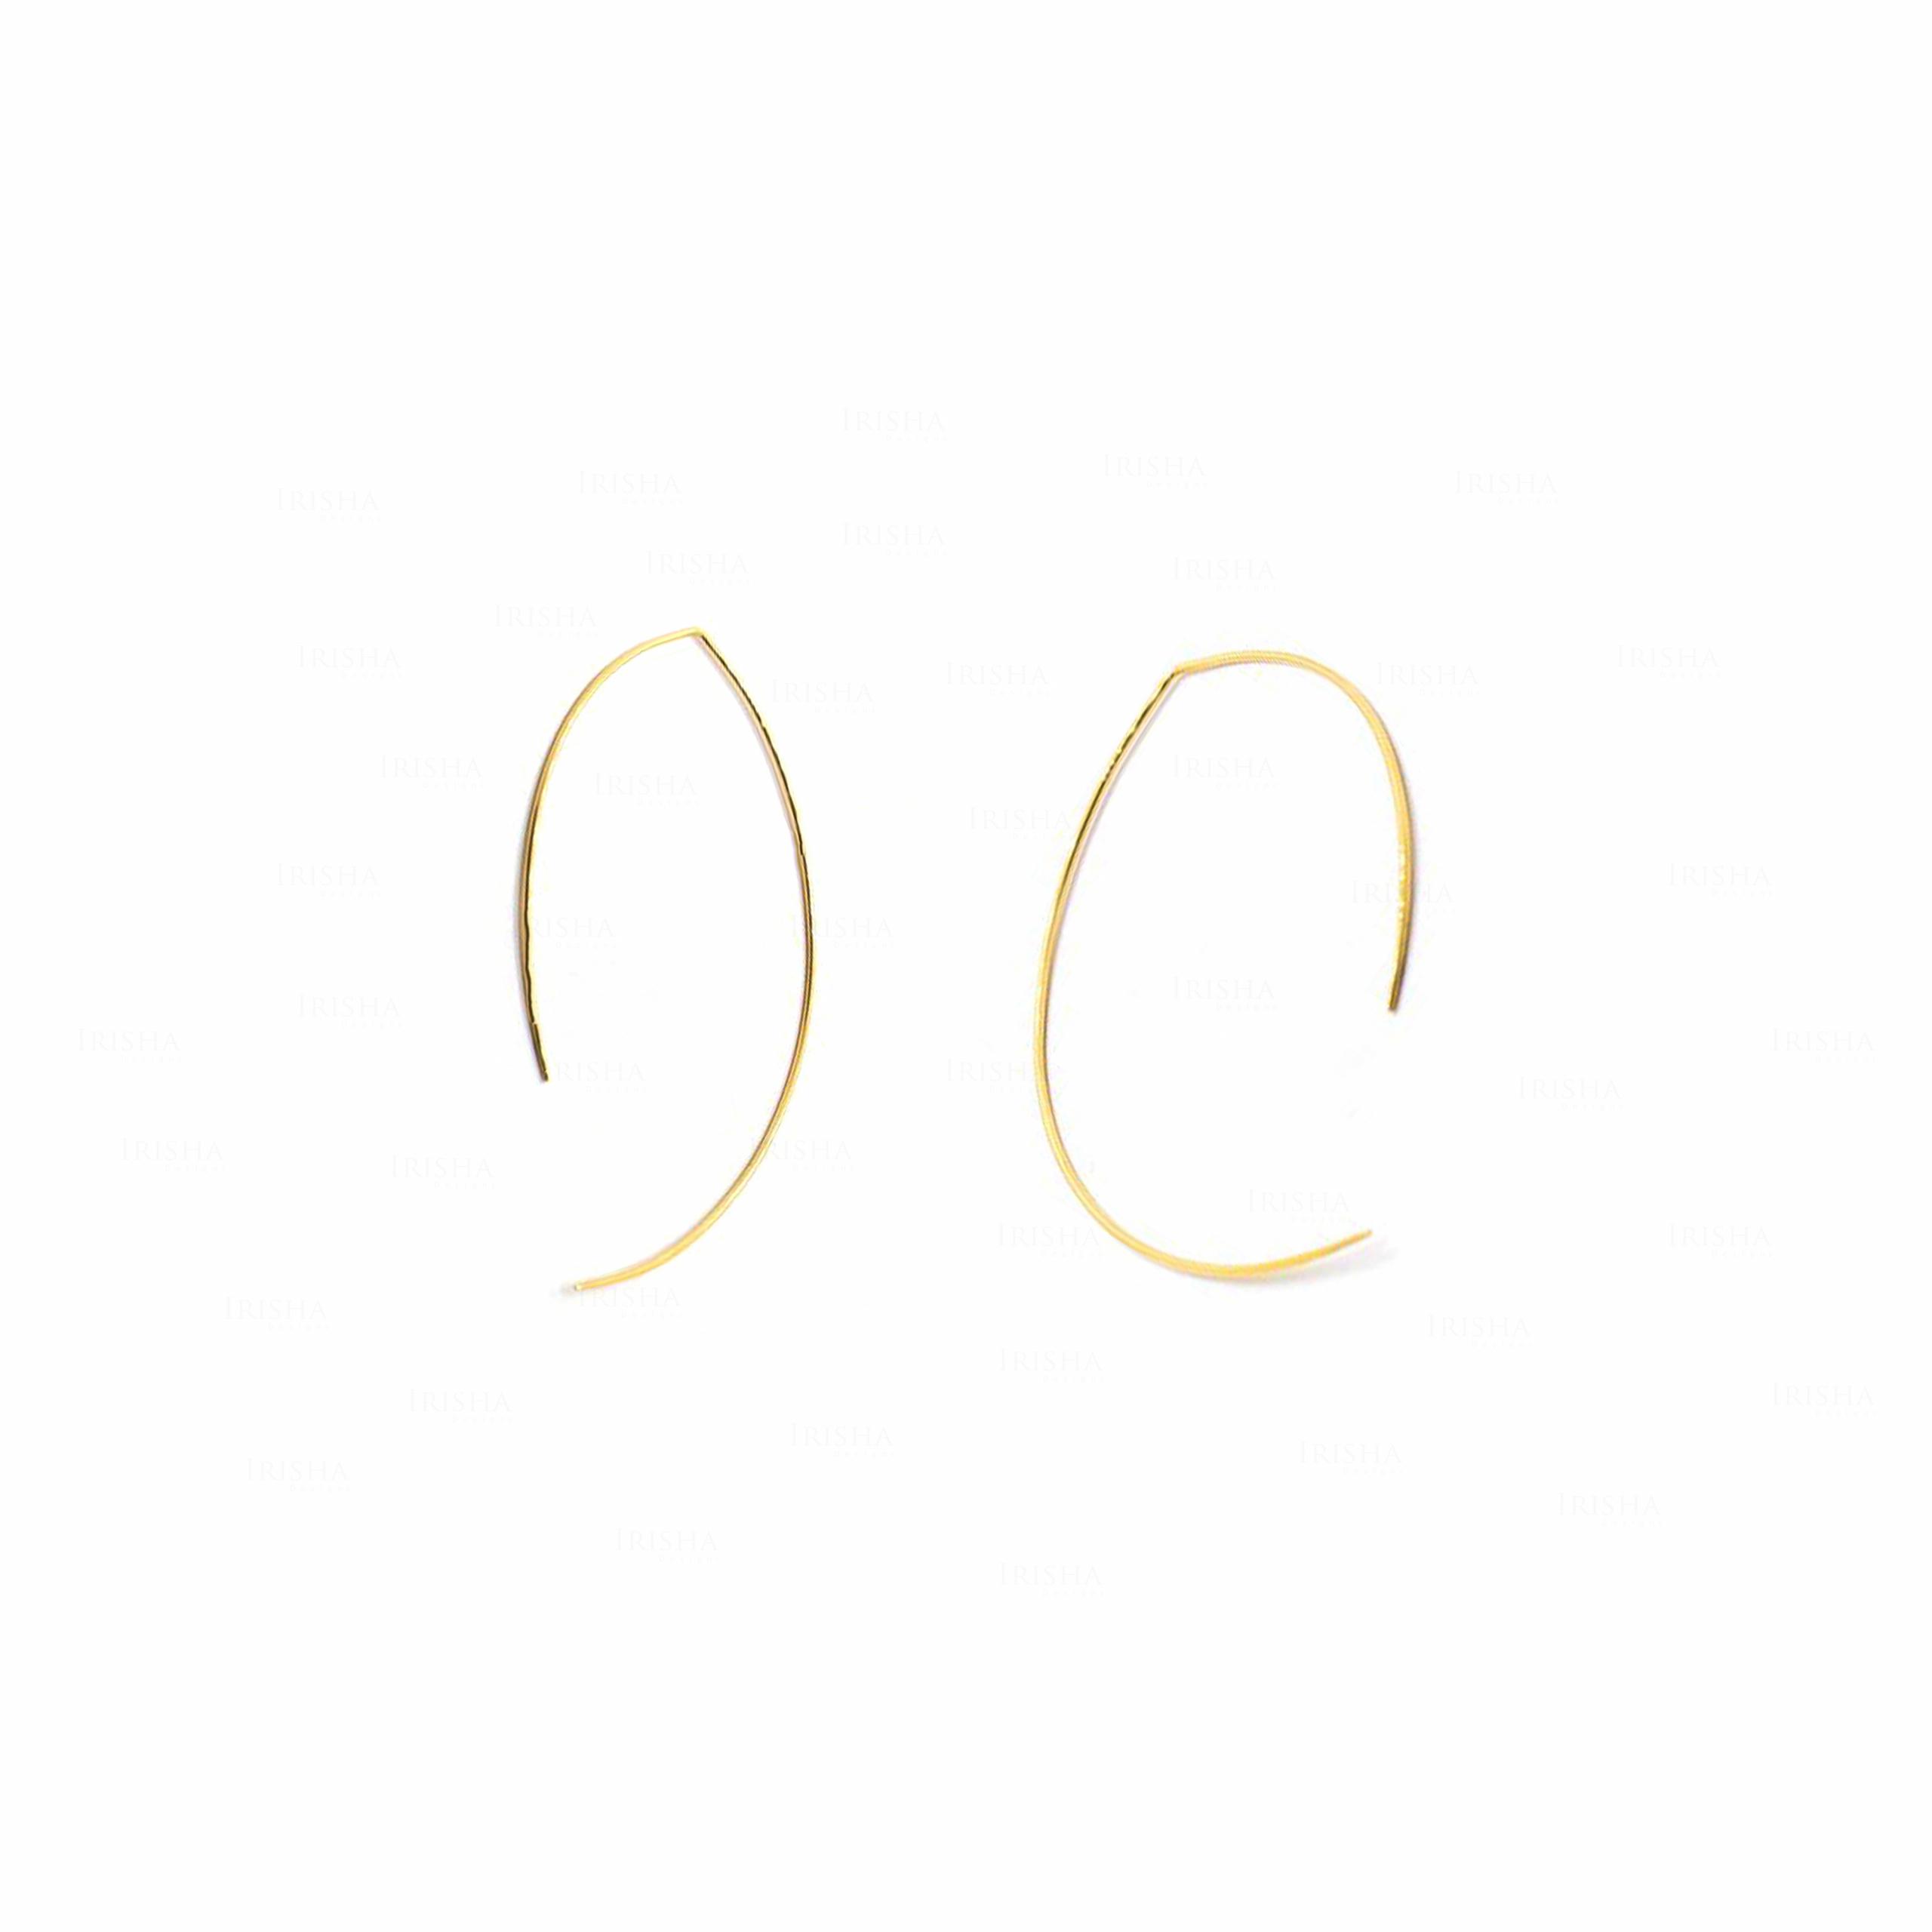 Oval Hoop Earrings | Solid Gold 14k